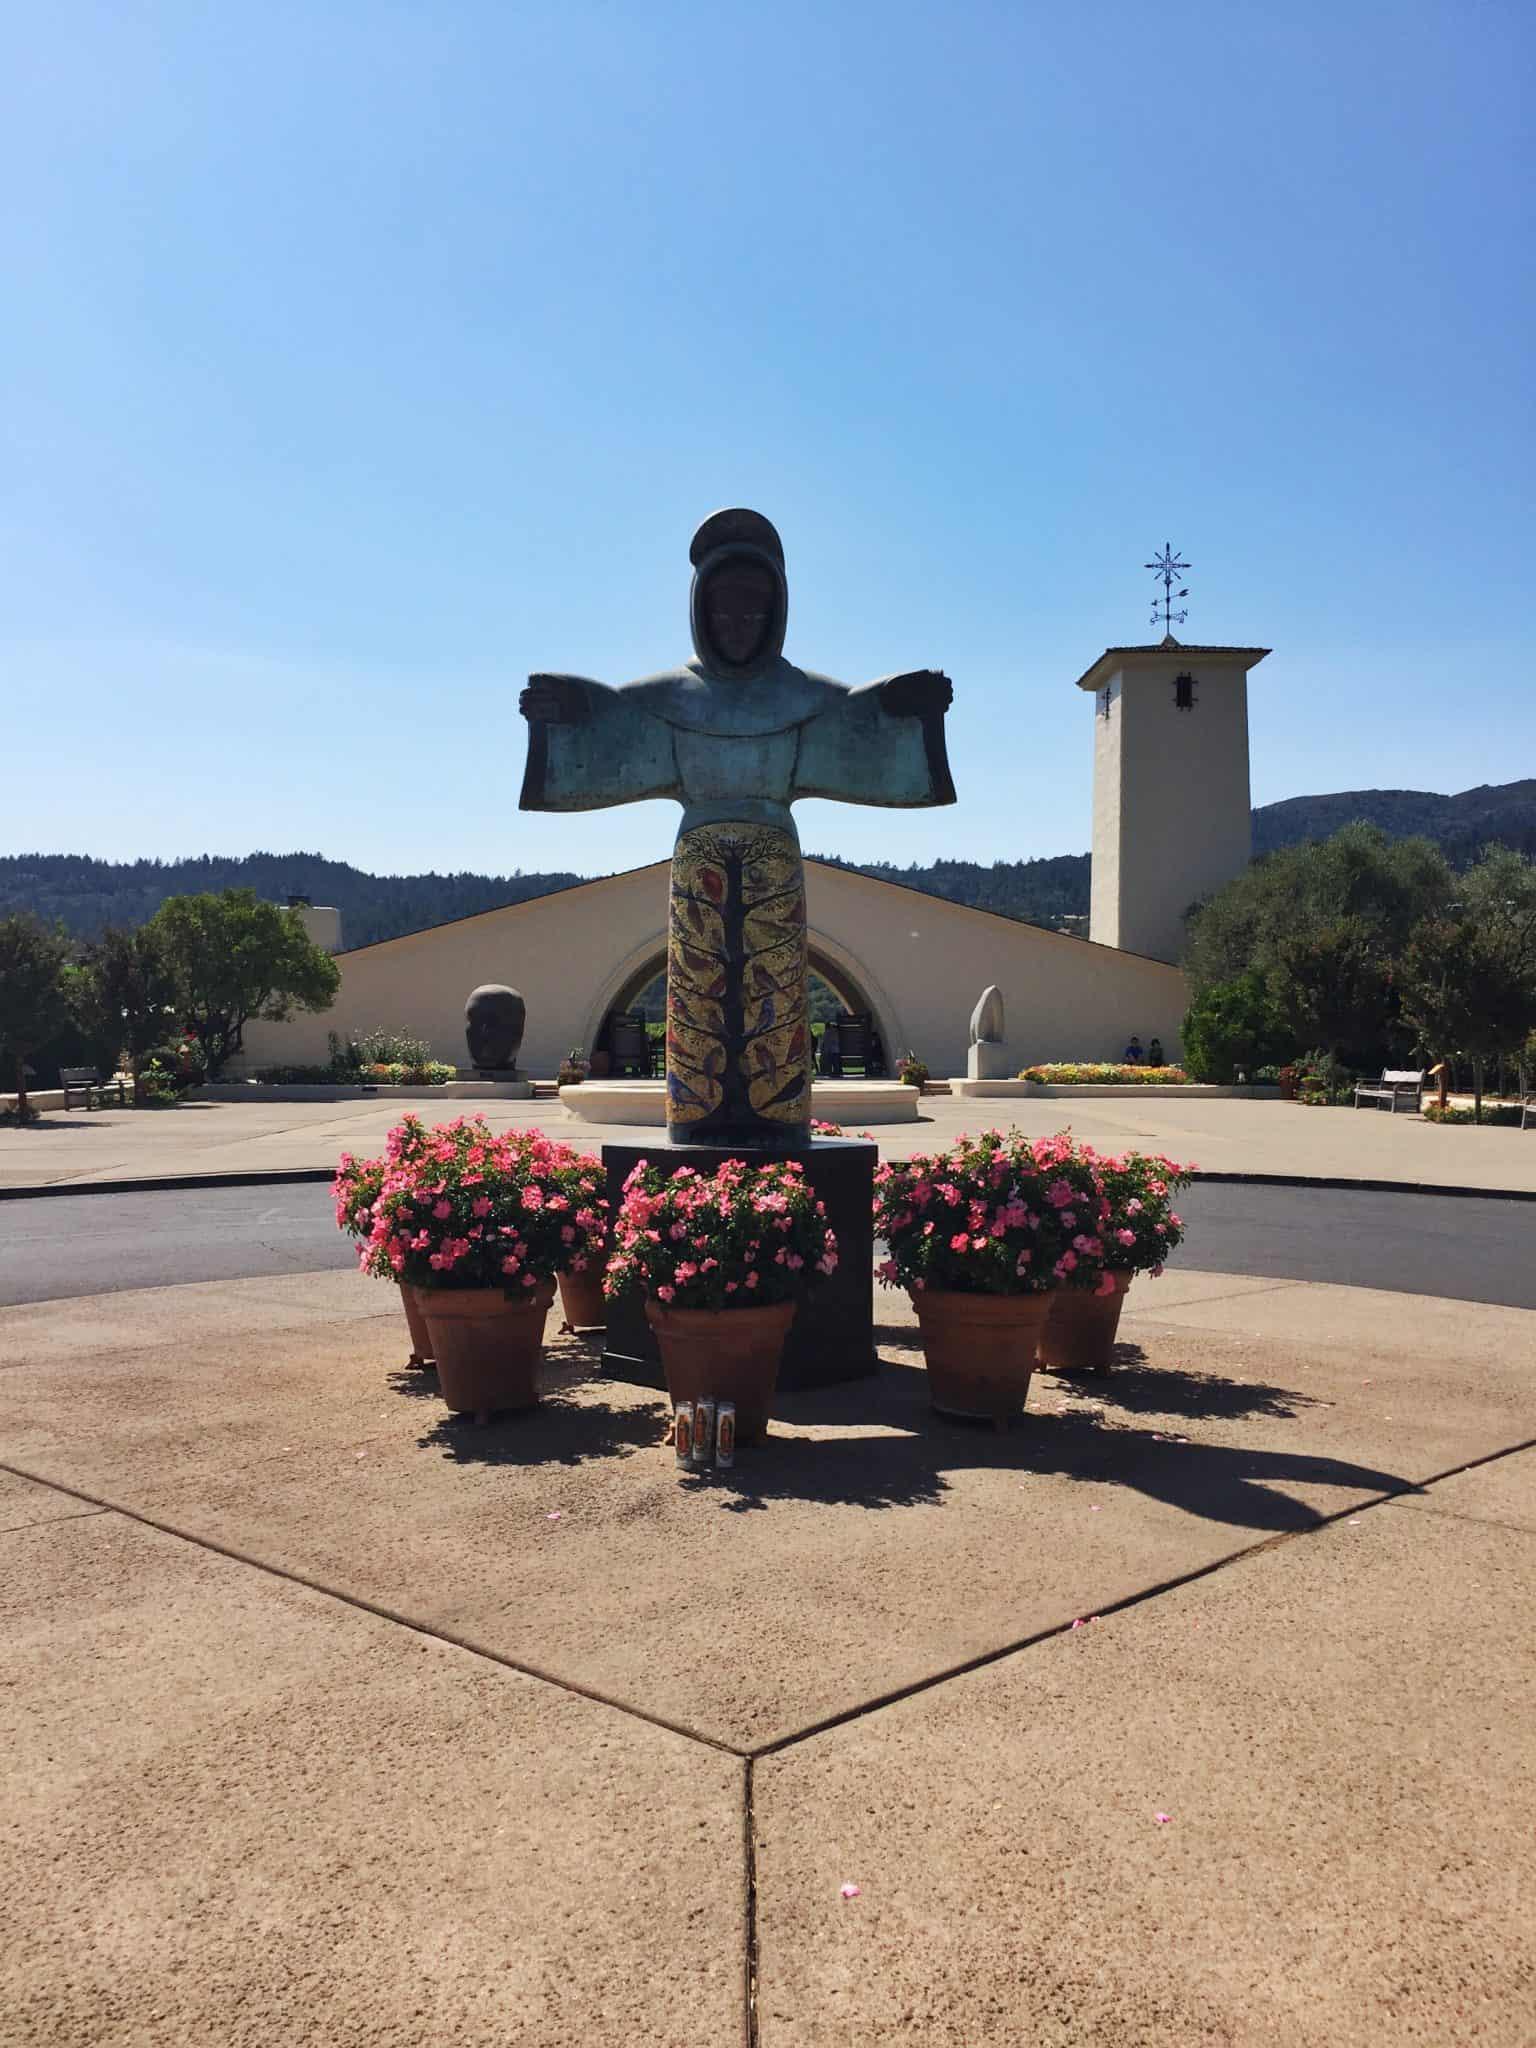 Our Visit to Robert Mondavi Winery